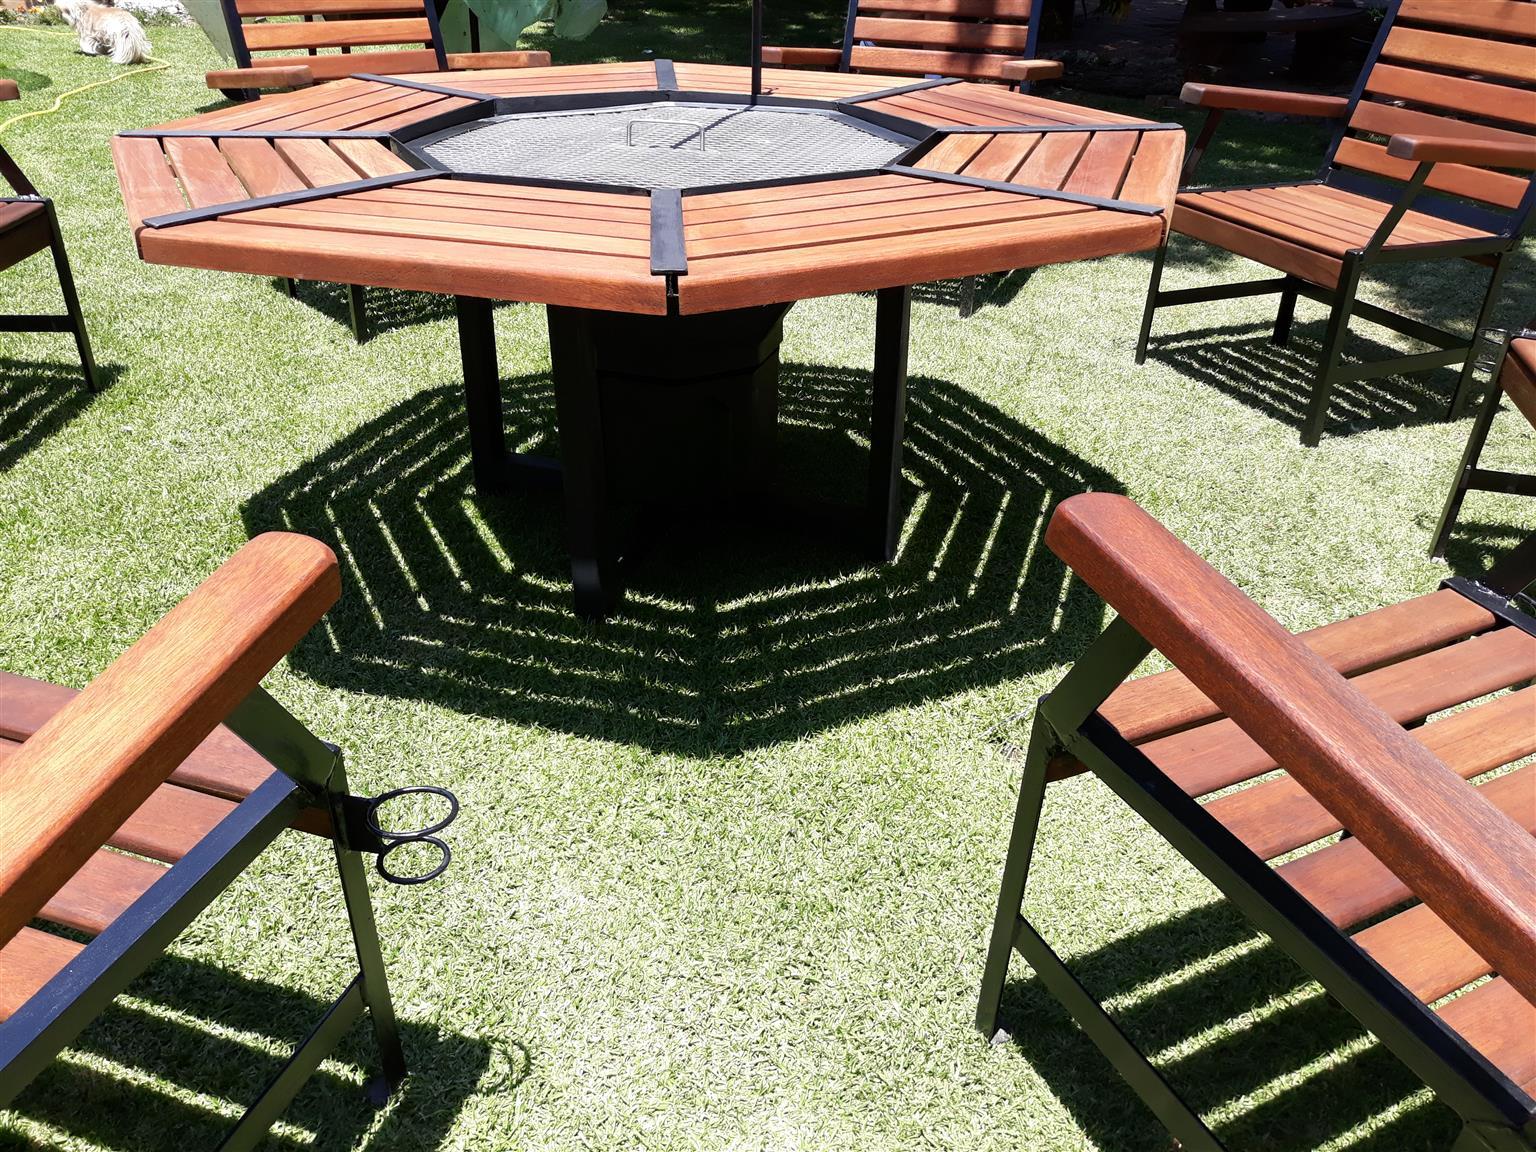 Braai table and chairs